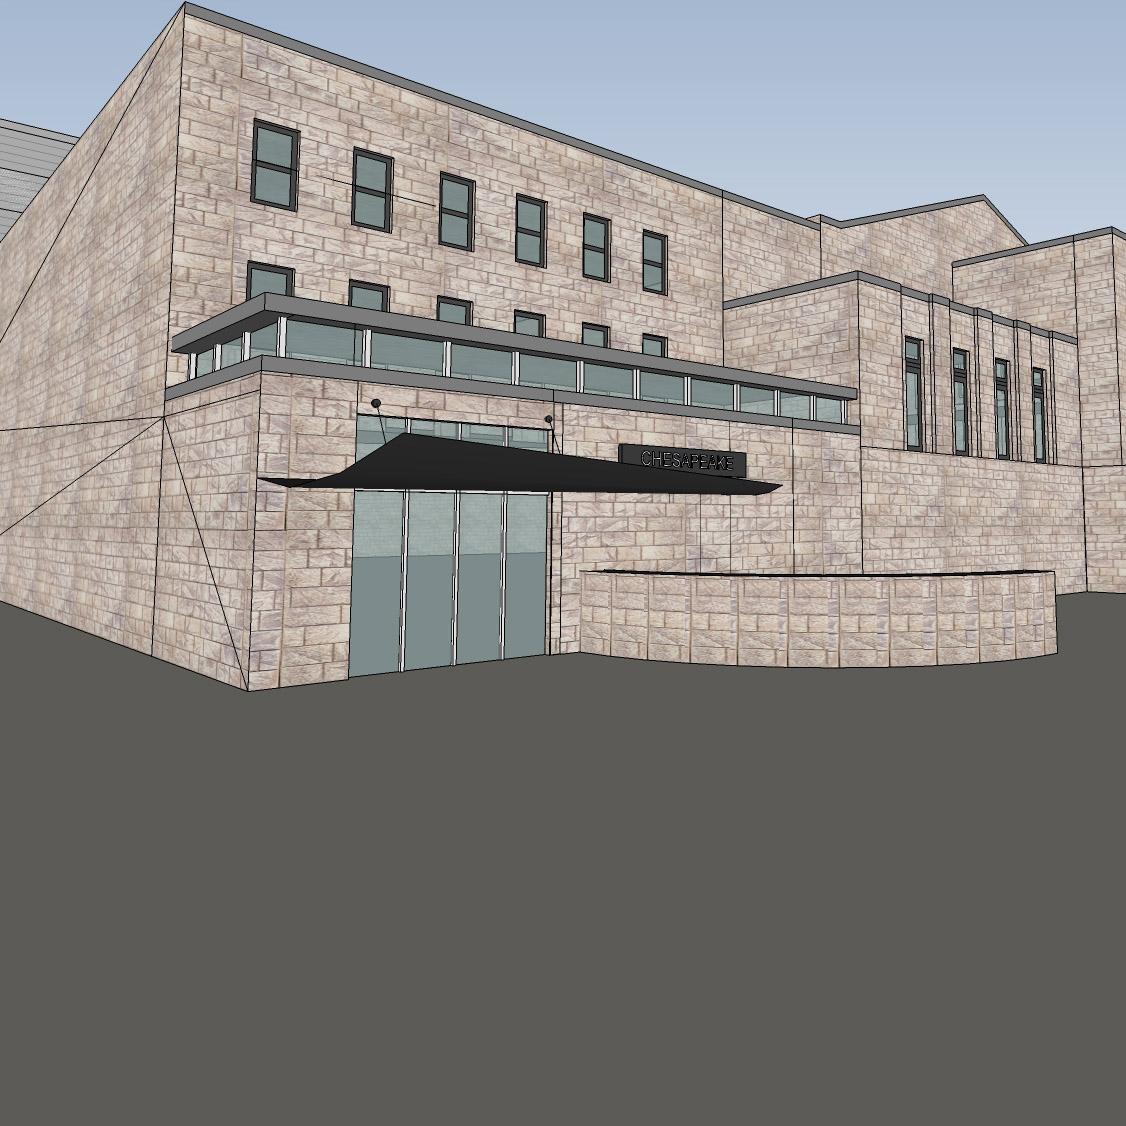 design proposal (Towson Armory)